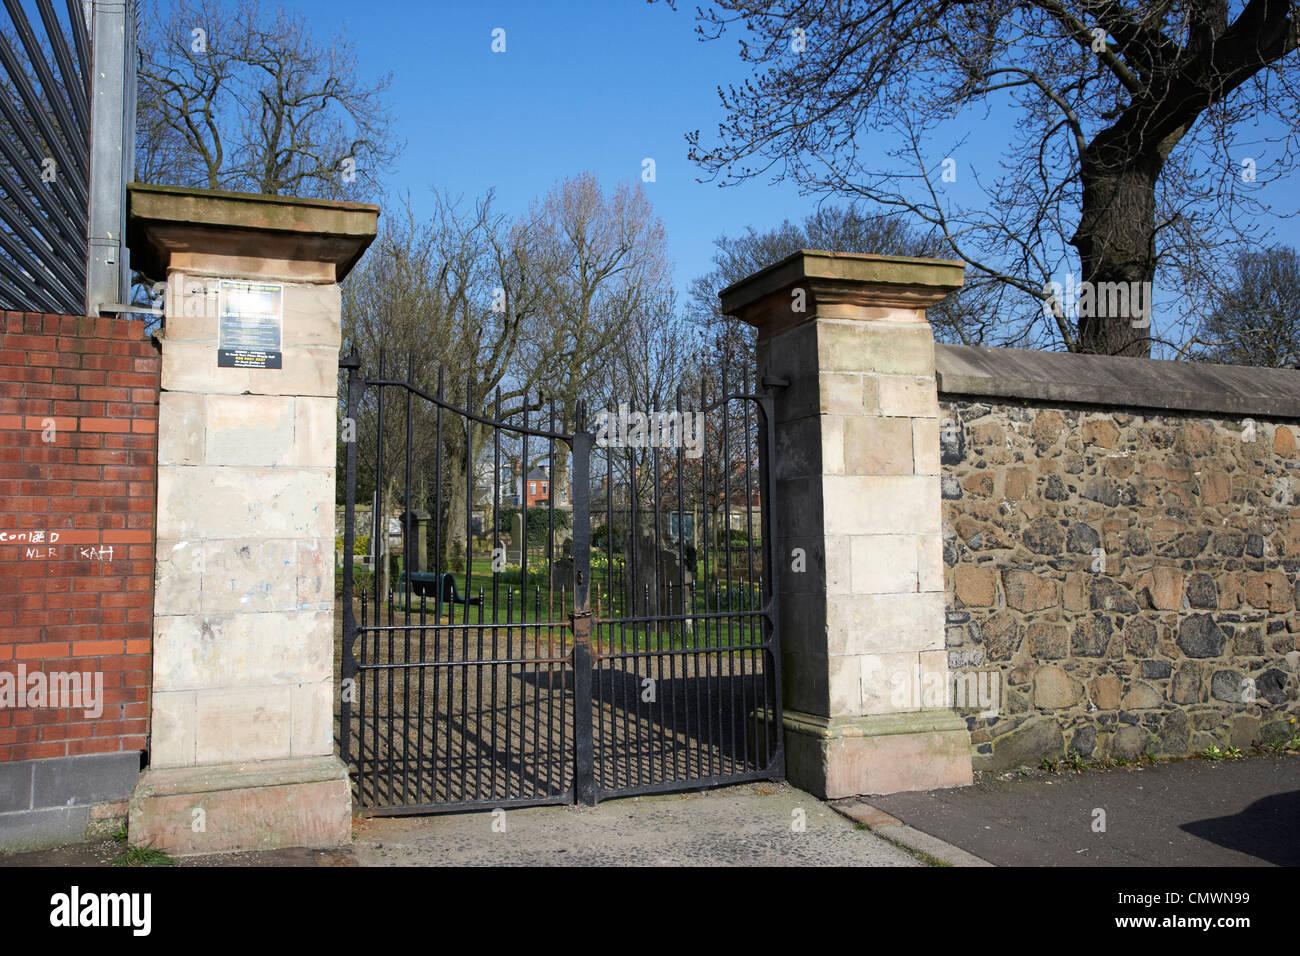 Clifton Street Cemetery Belfast Northern Ireland uk - Stock Image